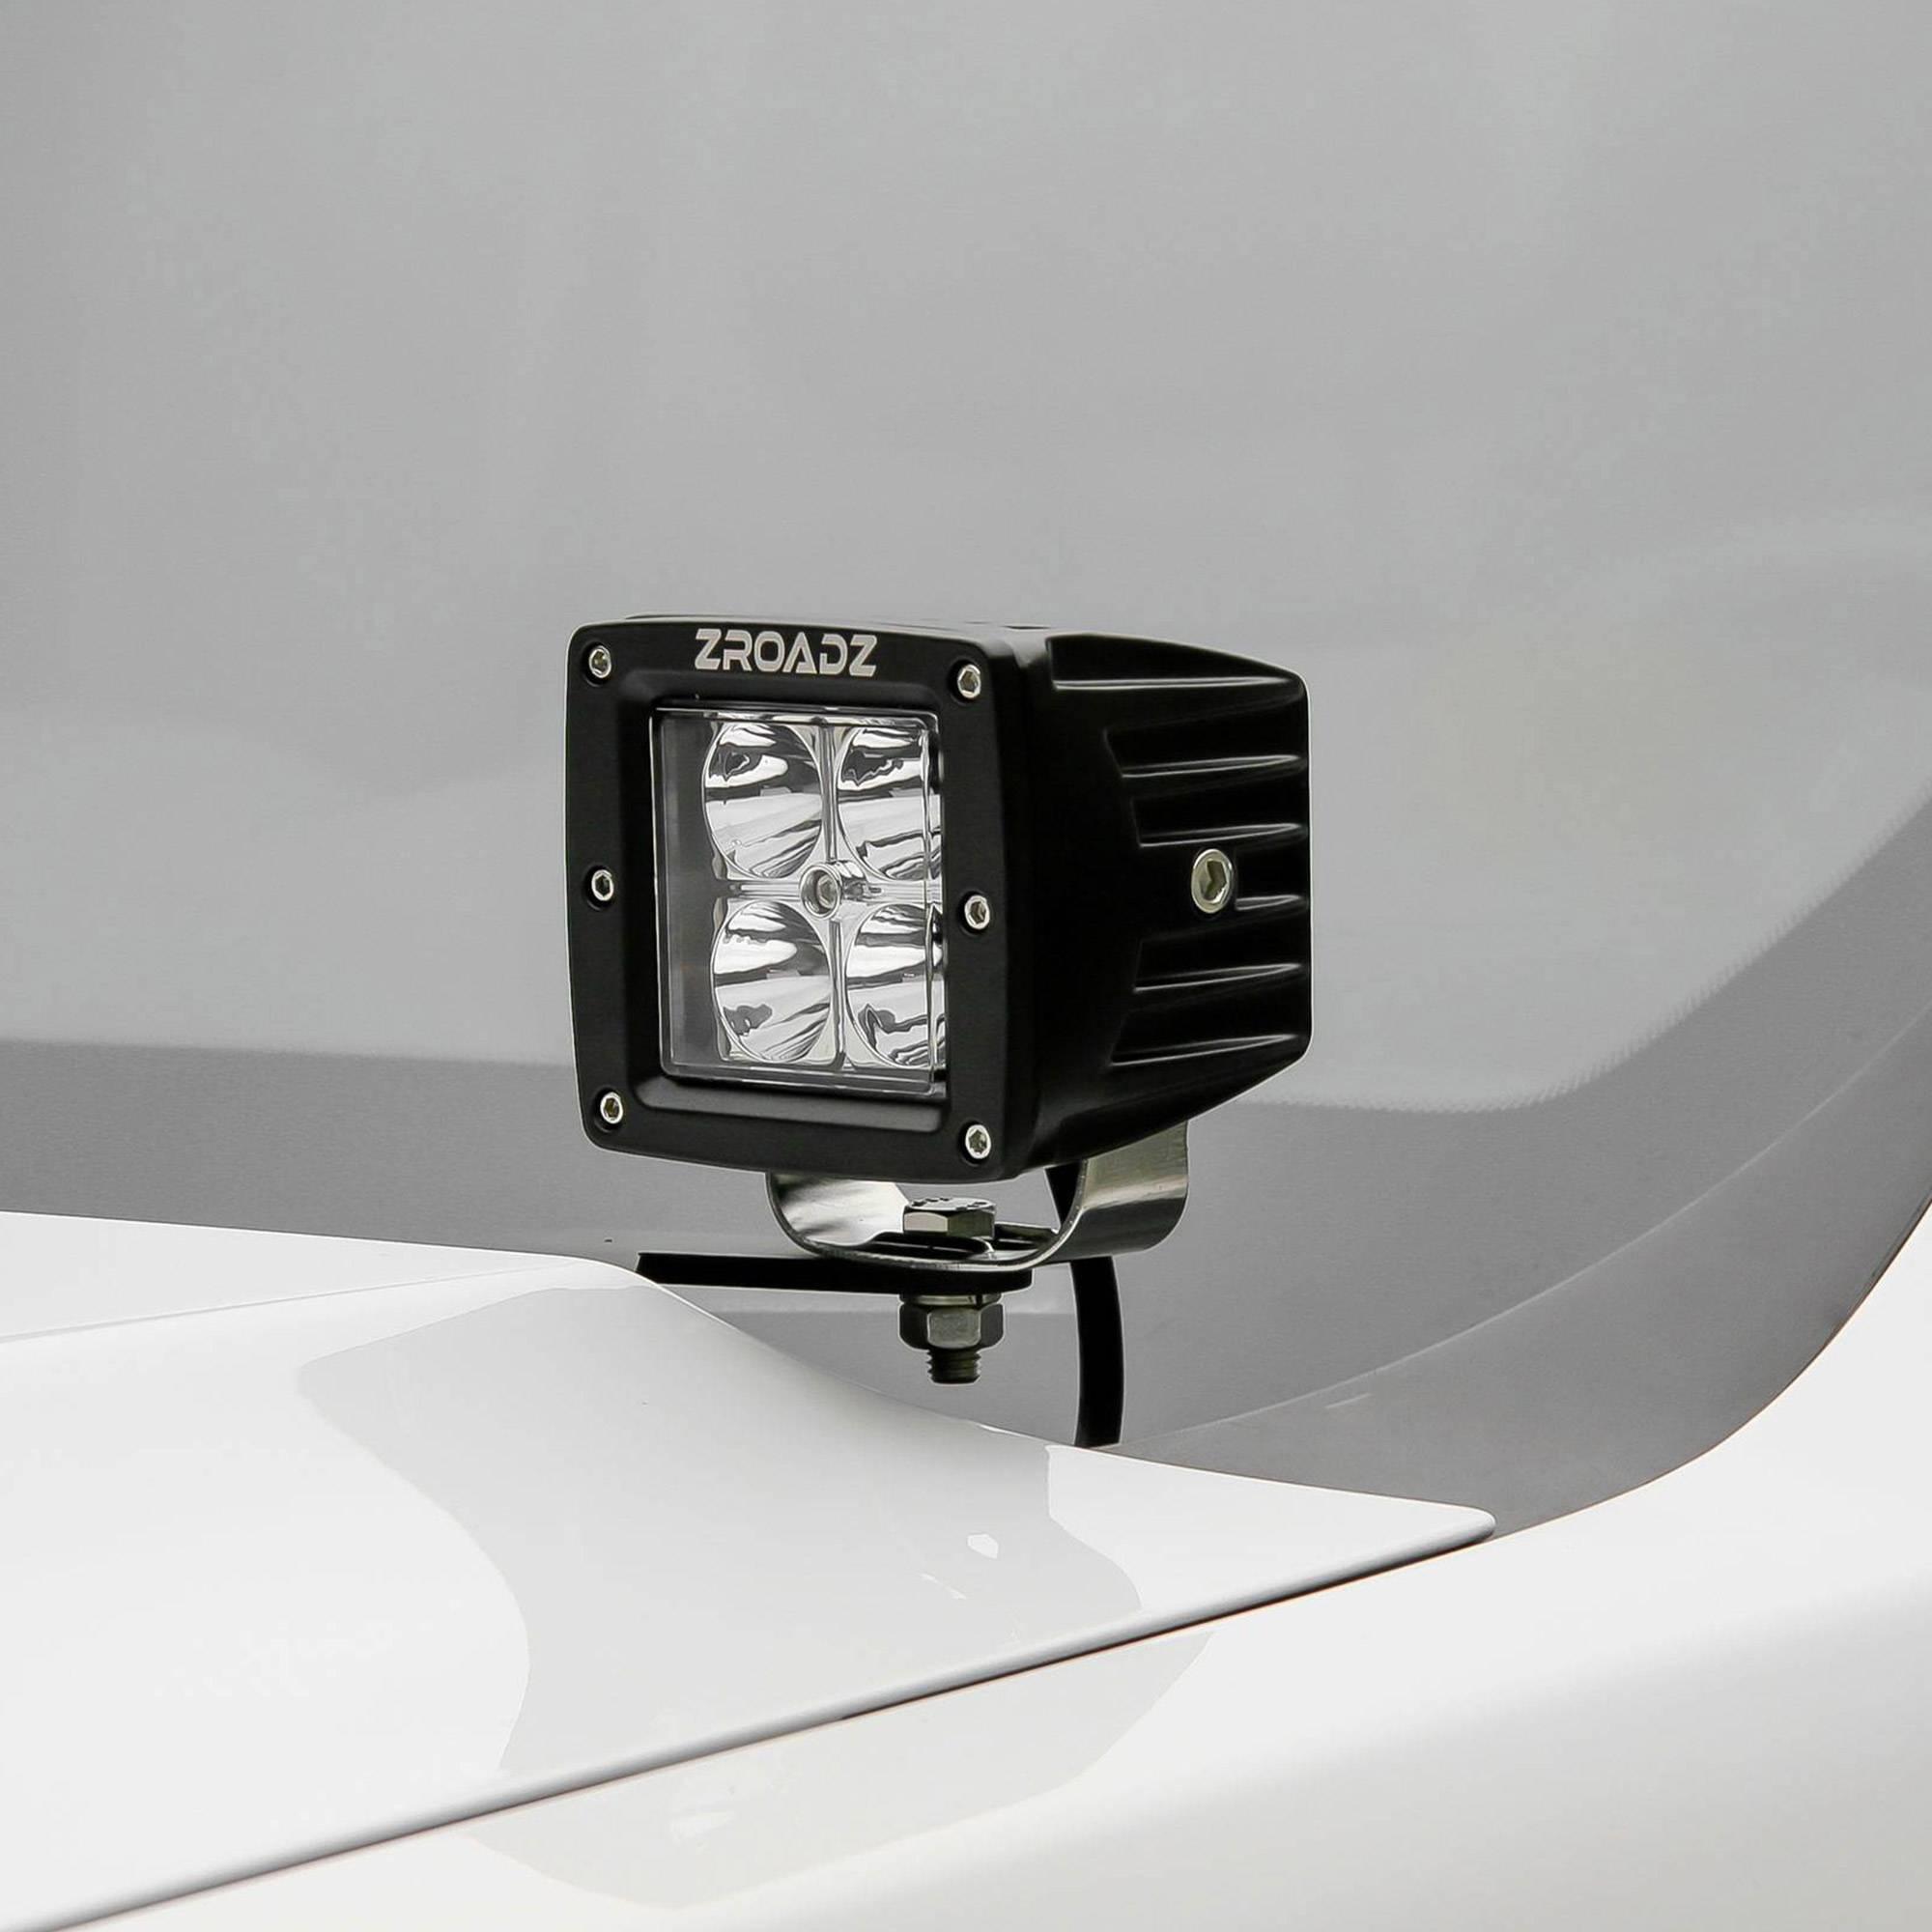 ZROADZ                                             - 2011-2016 Ford Super Duty Hood Hinge LED Kit with (2) 3 Inch LED Pod Lights - PN #Z365461-KIT2